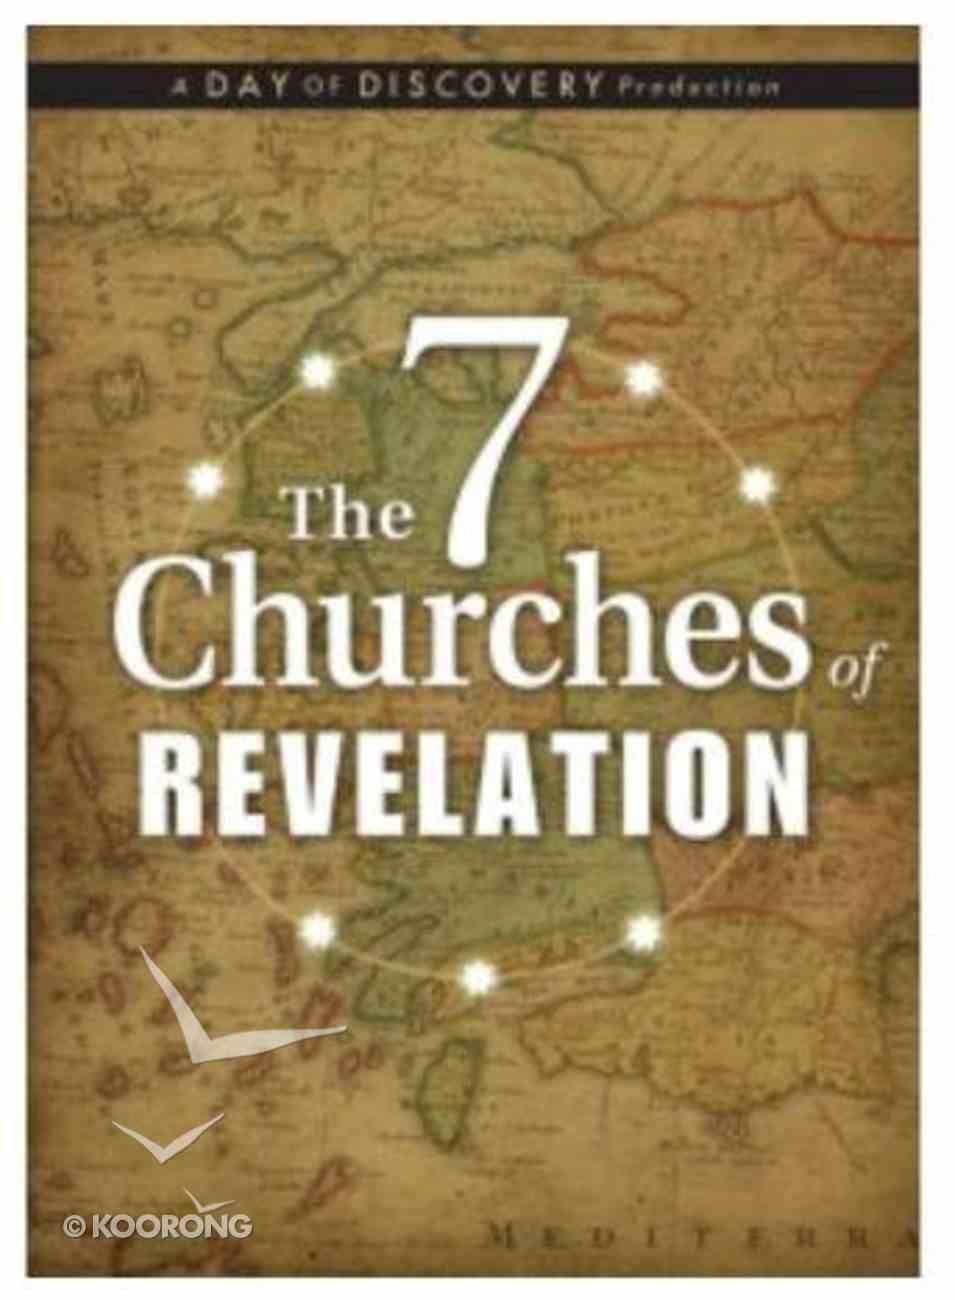 The 7 Churches of Revelation DVD